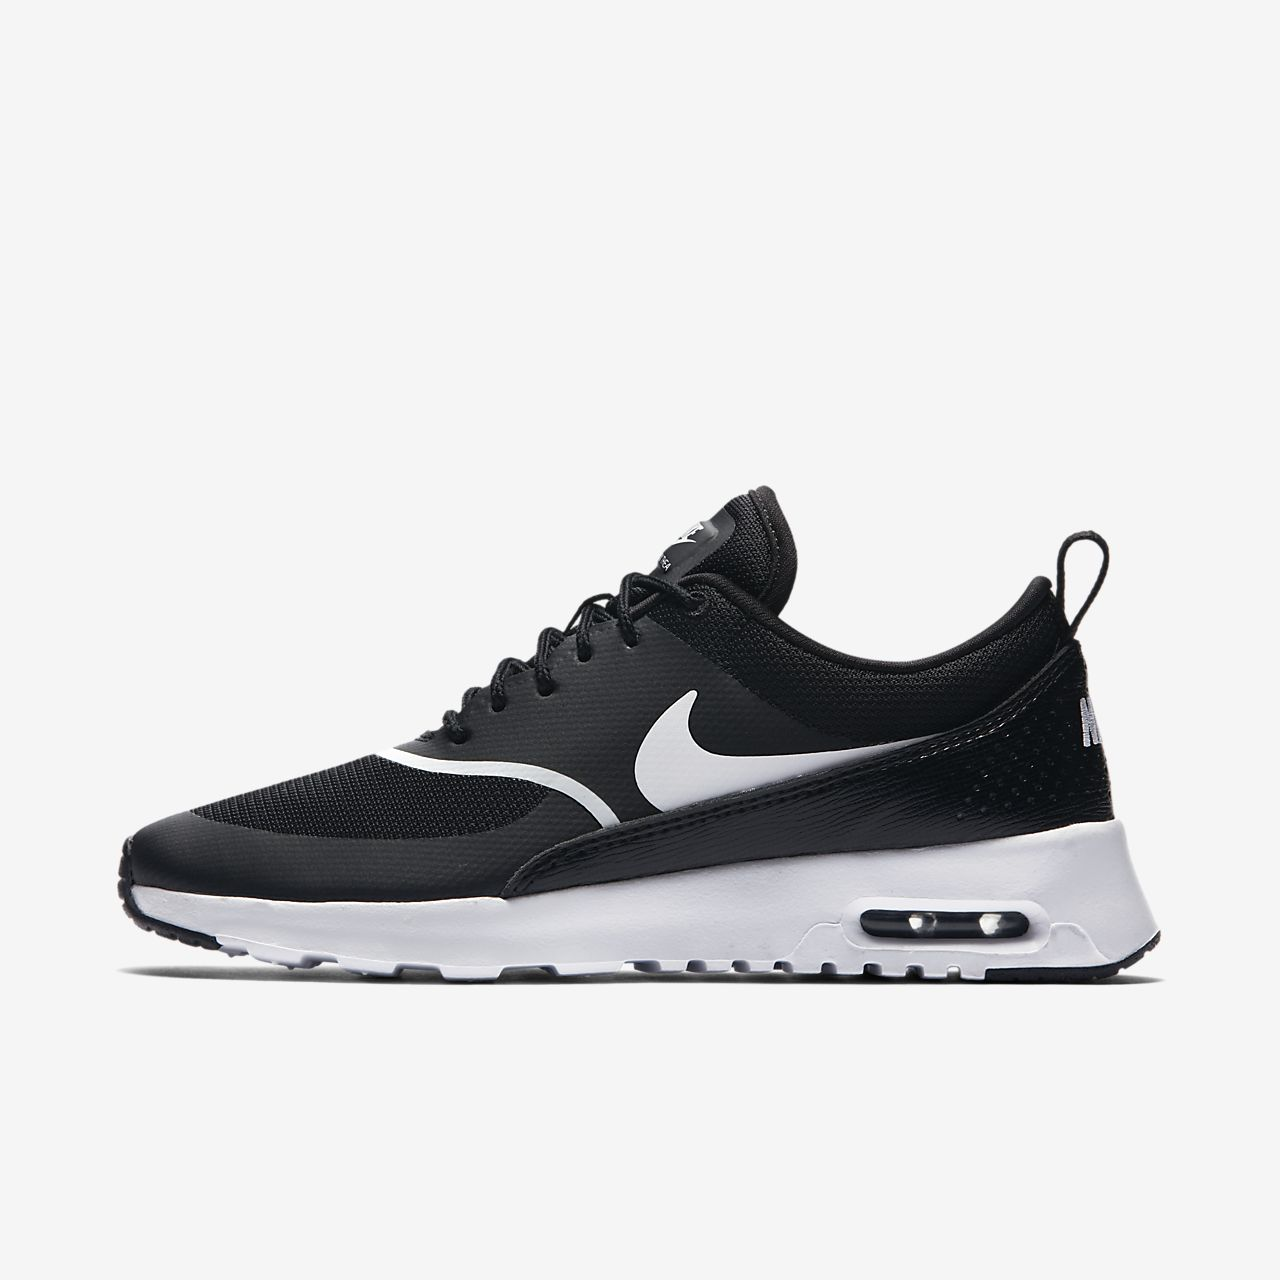 best service 4fa0a fe824 ... Calzado para mujer Nike Air Max Thea